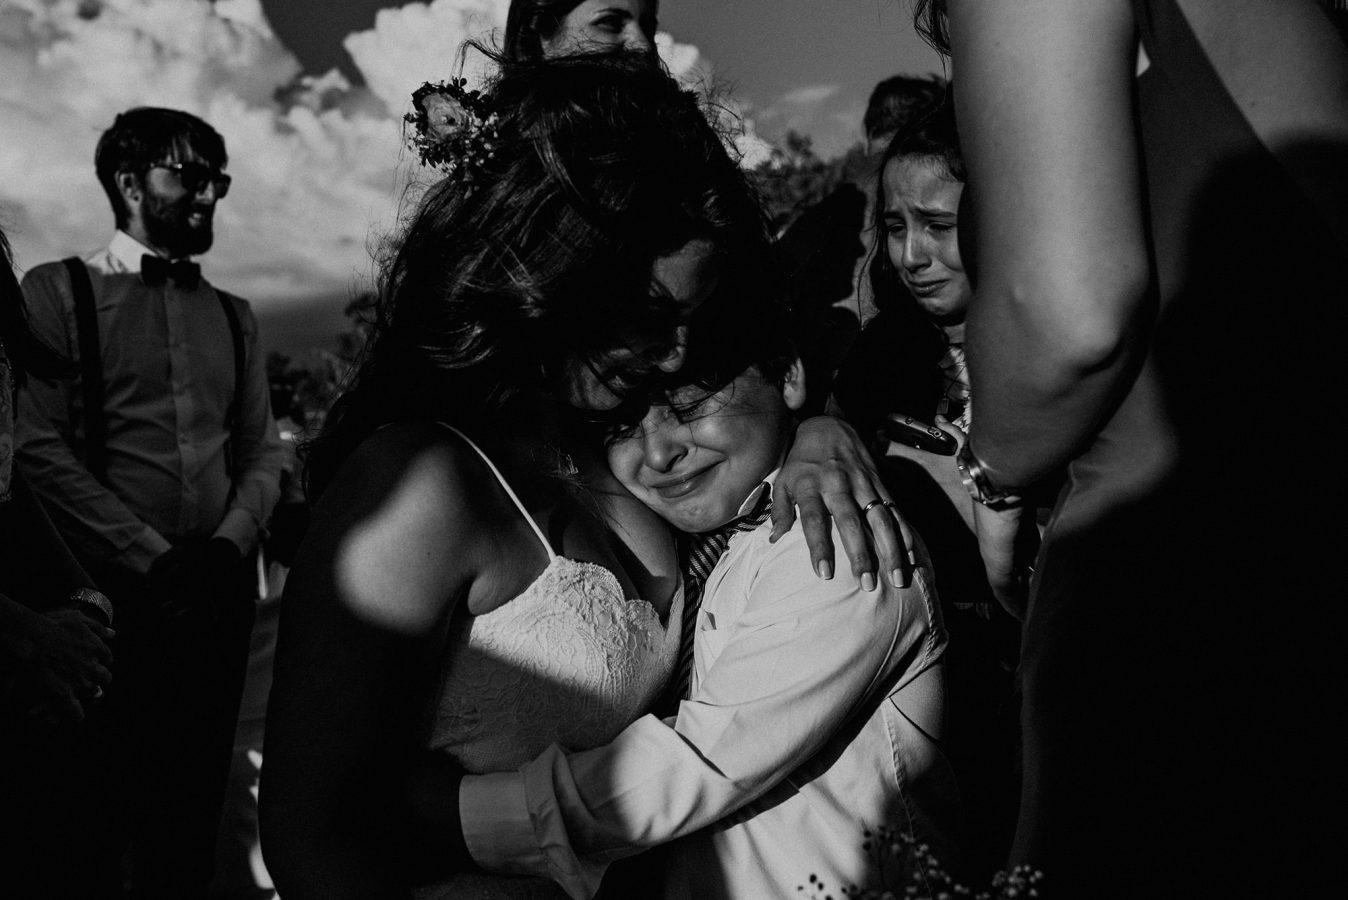 fotografos-de-boda-uruguay-12